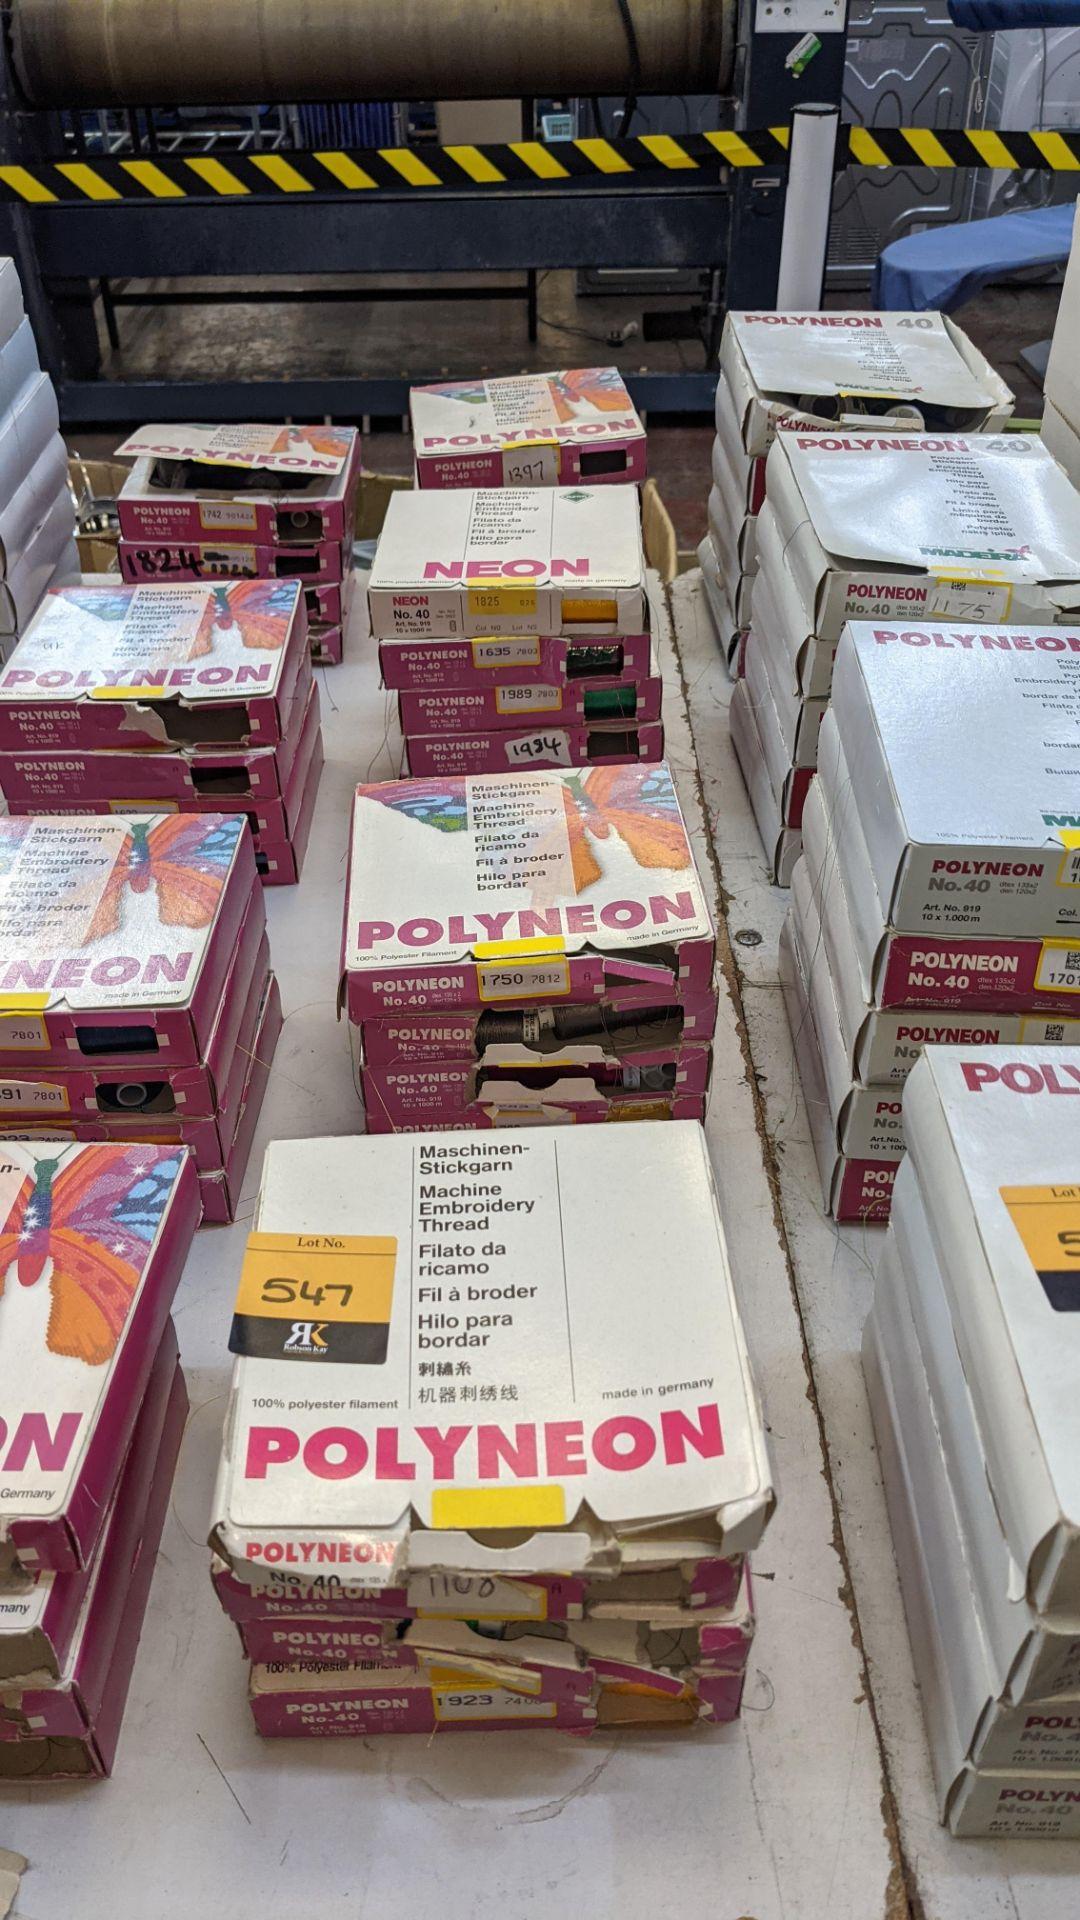 18 boxes of Madeira Polyneon machine embroidery thread